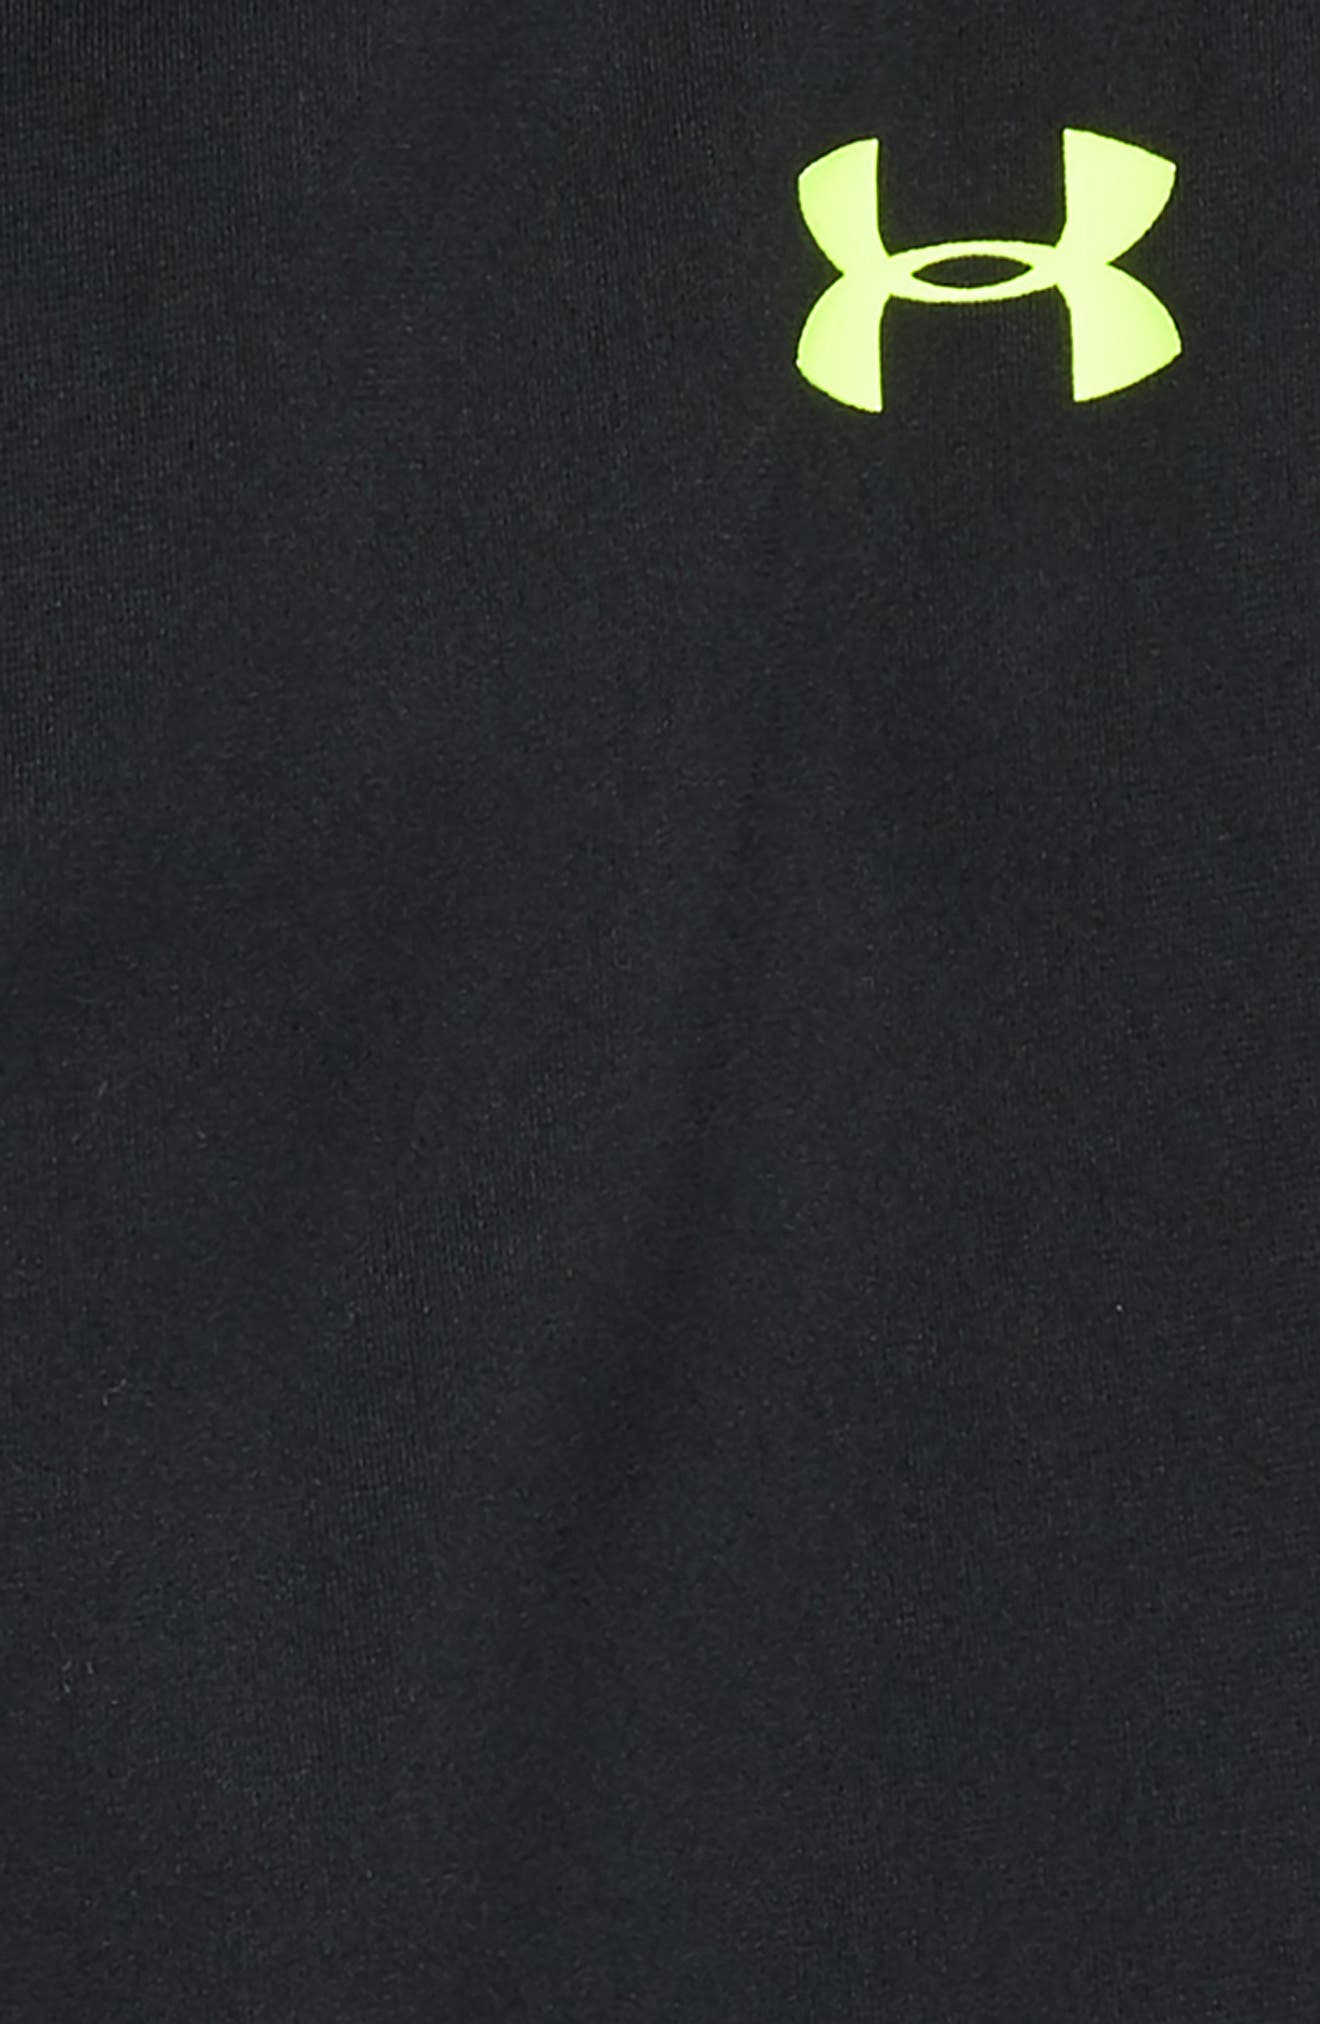 Pennant 2.0 Pants,                             Alternate thumbnail 2, color,                             BLACK